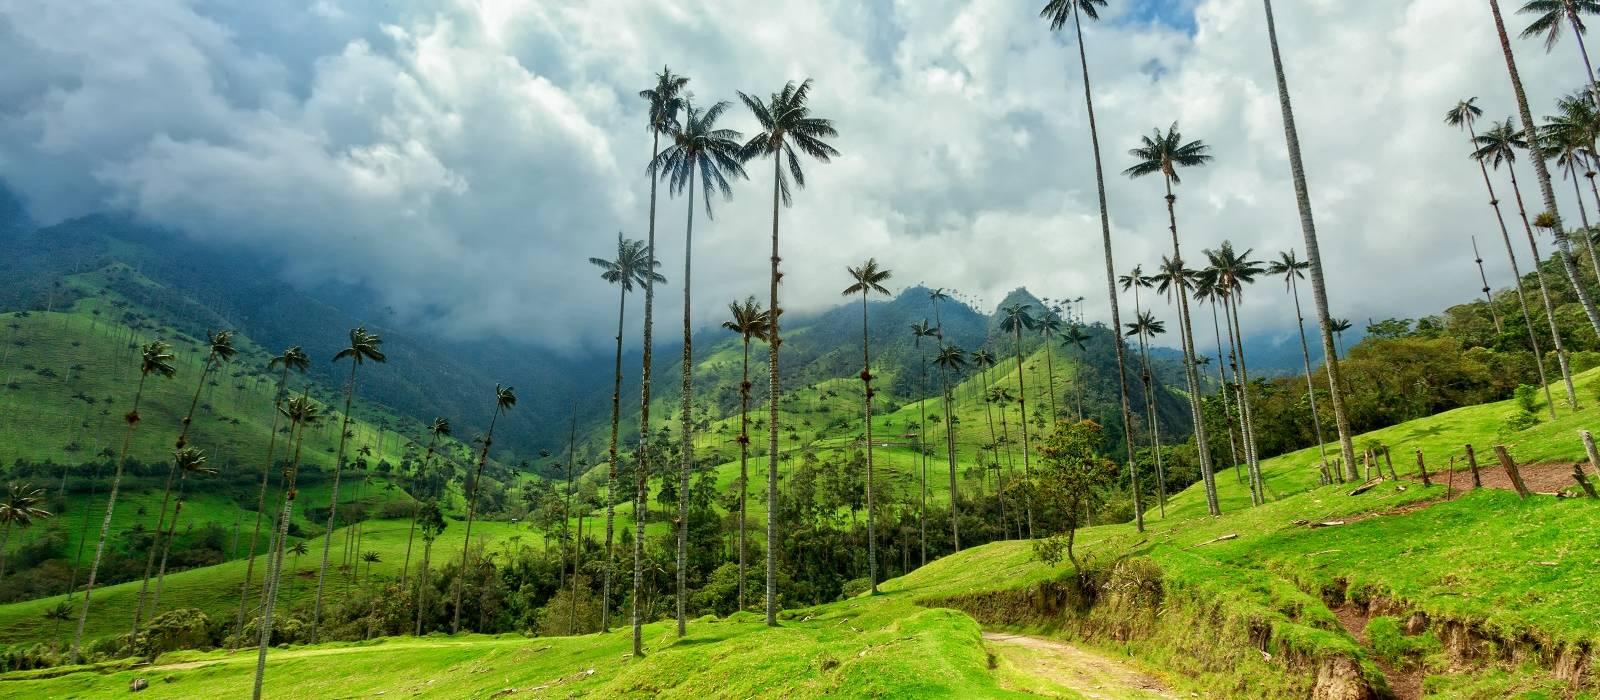 UNESCO World Heritage Site, Coffee Region, Colombia, South America